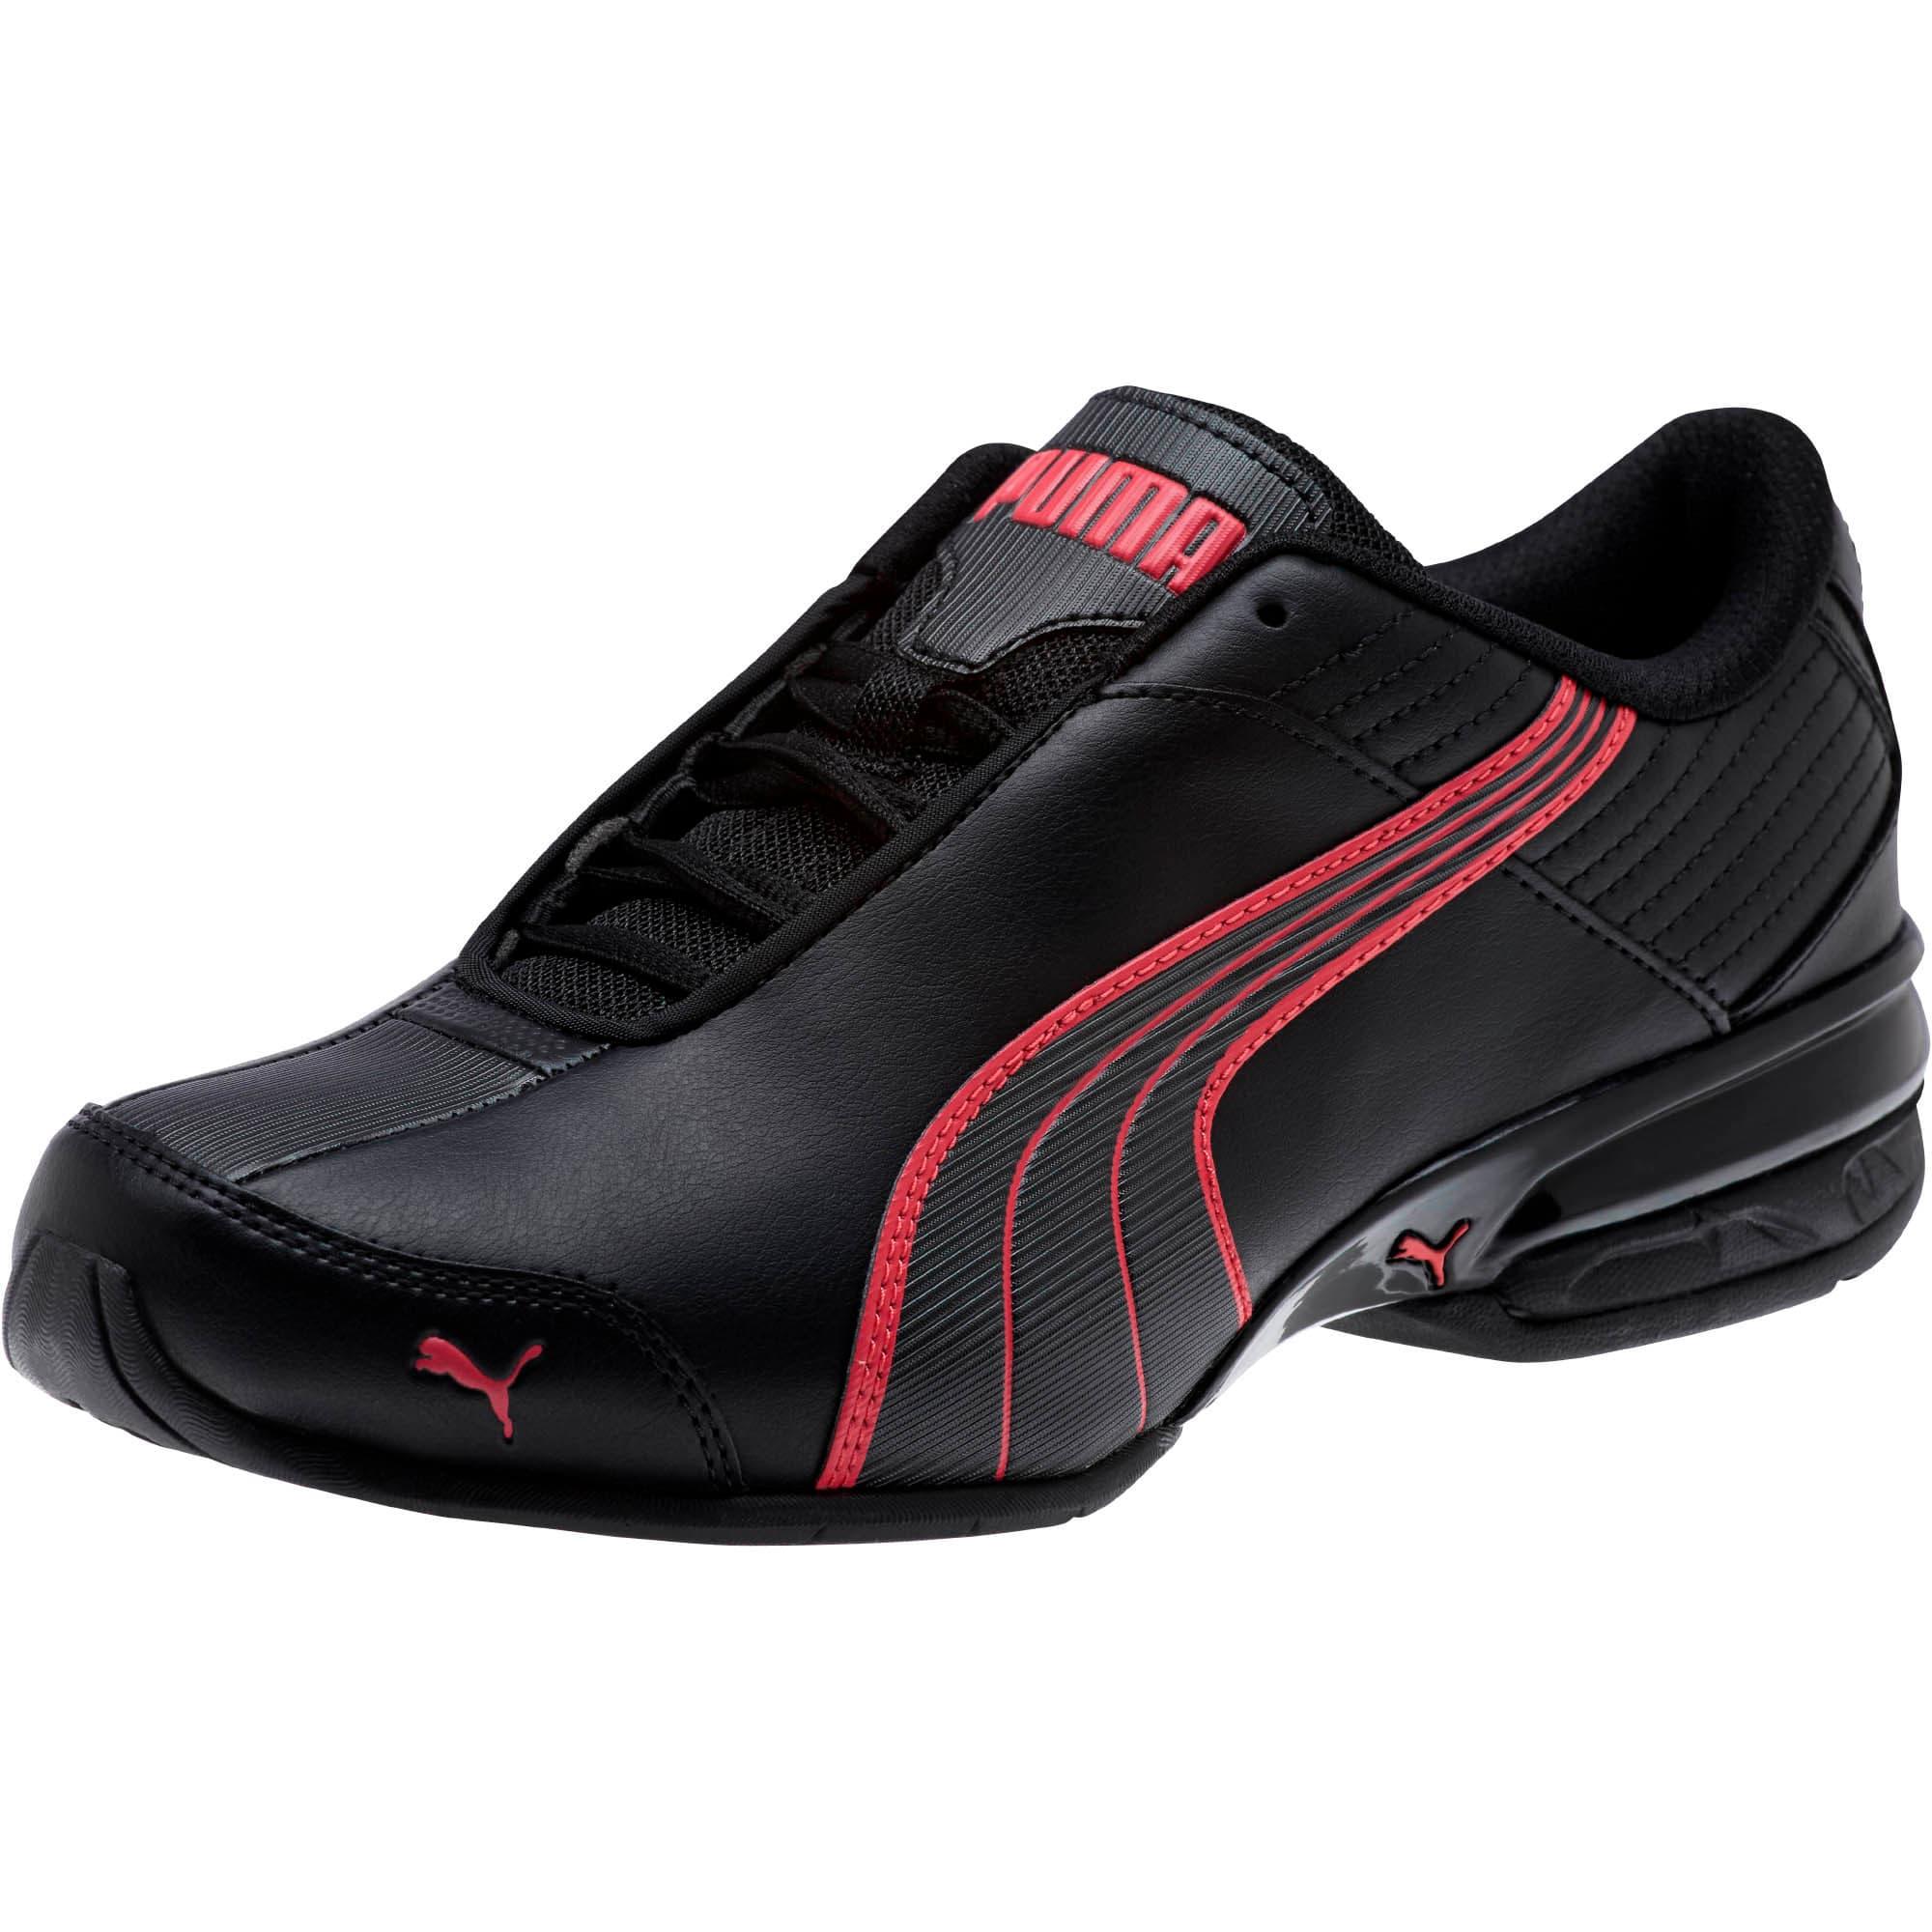 Thumbnail 1 of Super Elevate Women's Training Shoes, Puma Black-Paradise Pink, medium